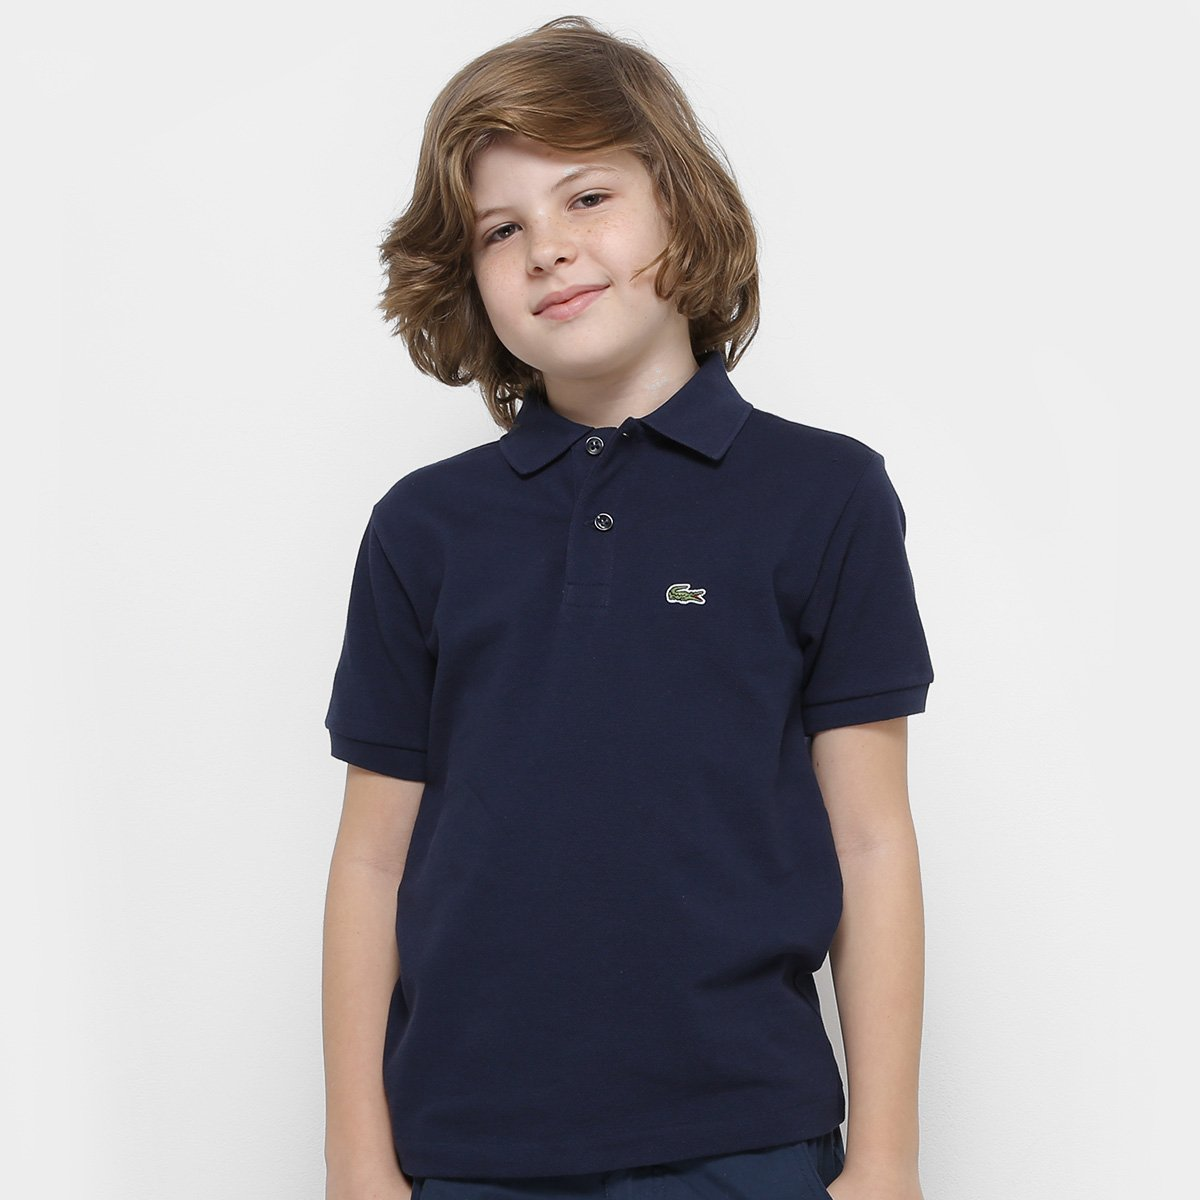 8d33ec32e5db1 Camisa Polo Infantil Lacoste Masculina